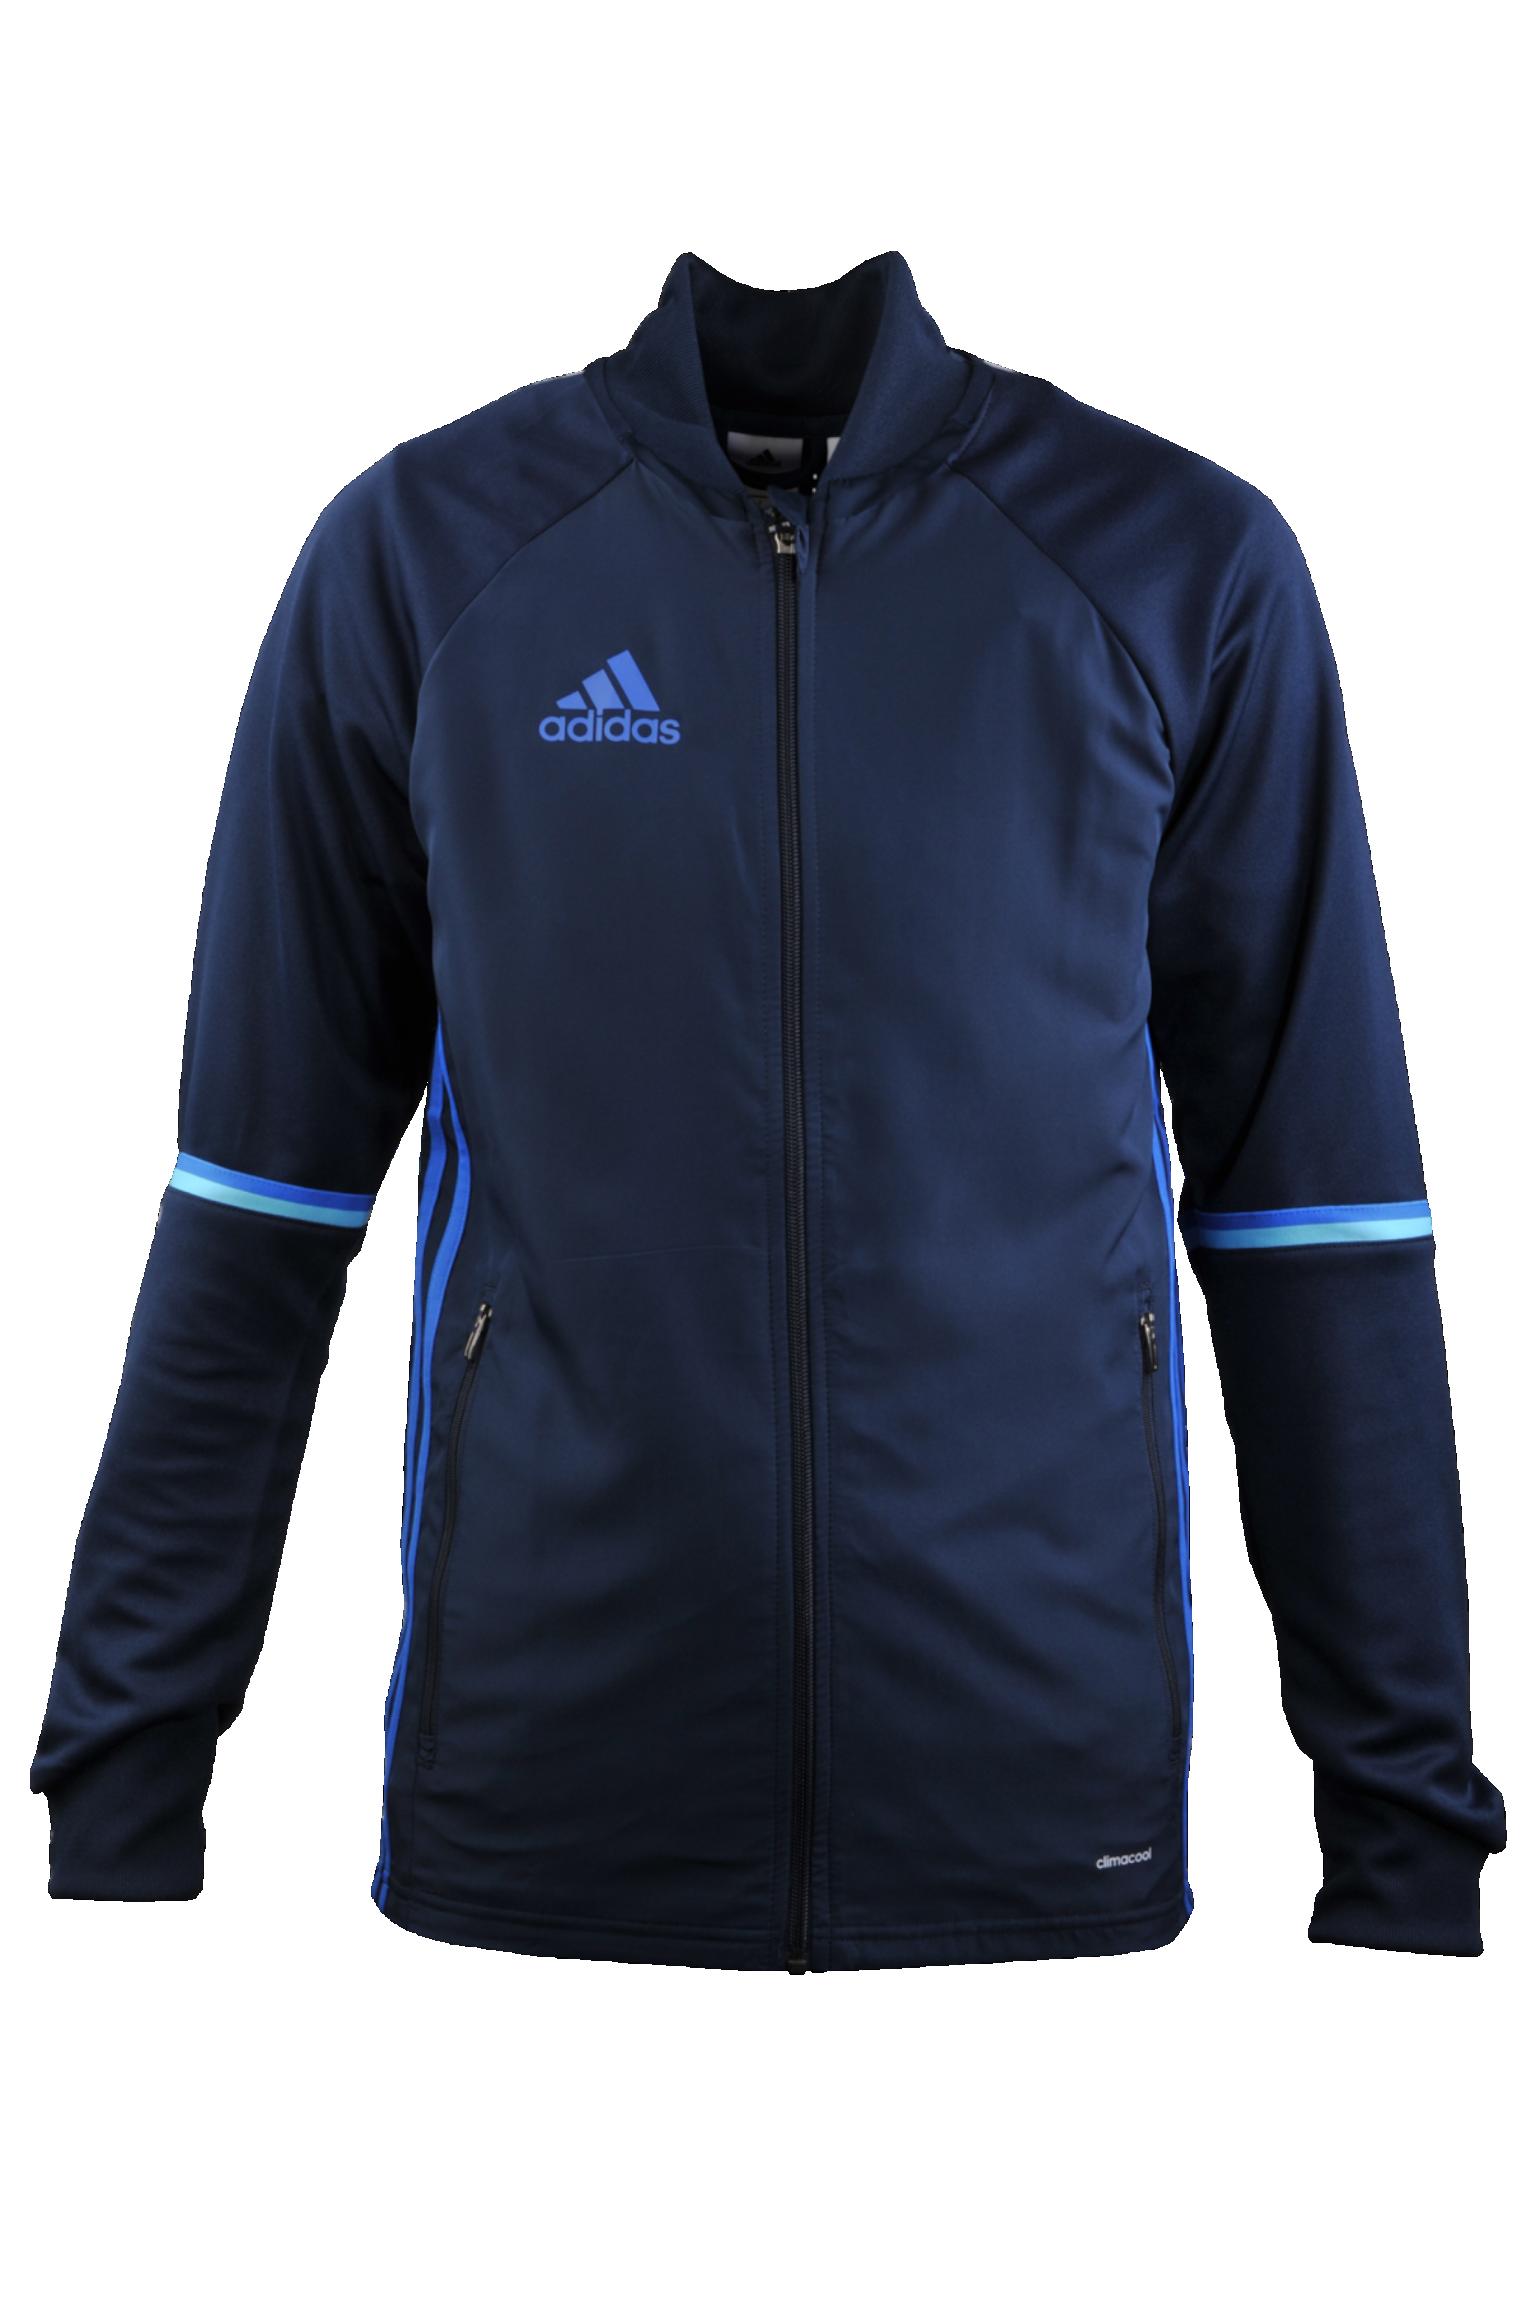 Sweatshirt Adidas Condivo Training 16 R Gol Com Football Boots Equipment [ 2300 x 1533 Pixel ]